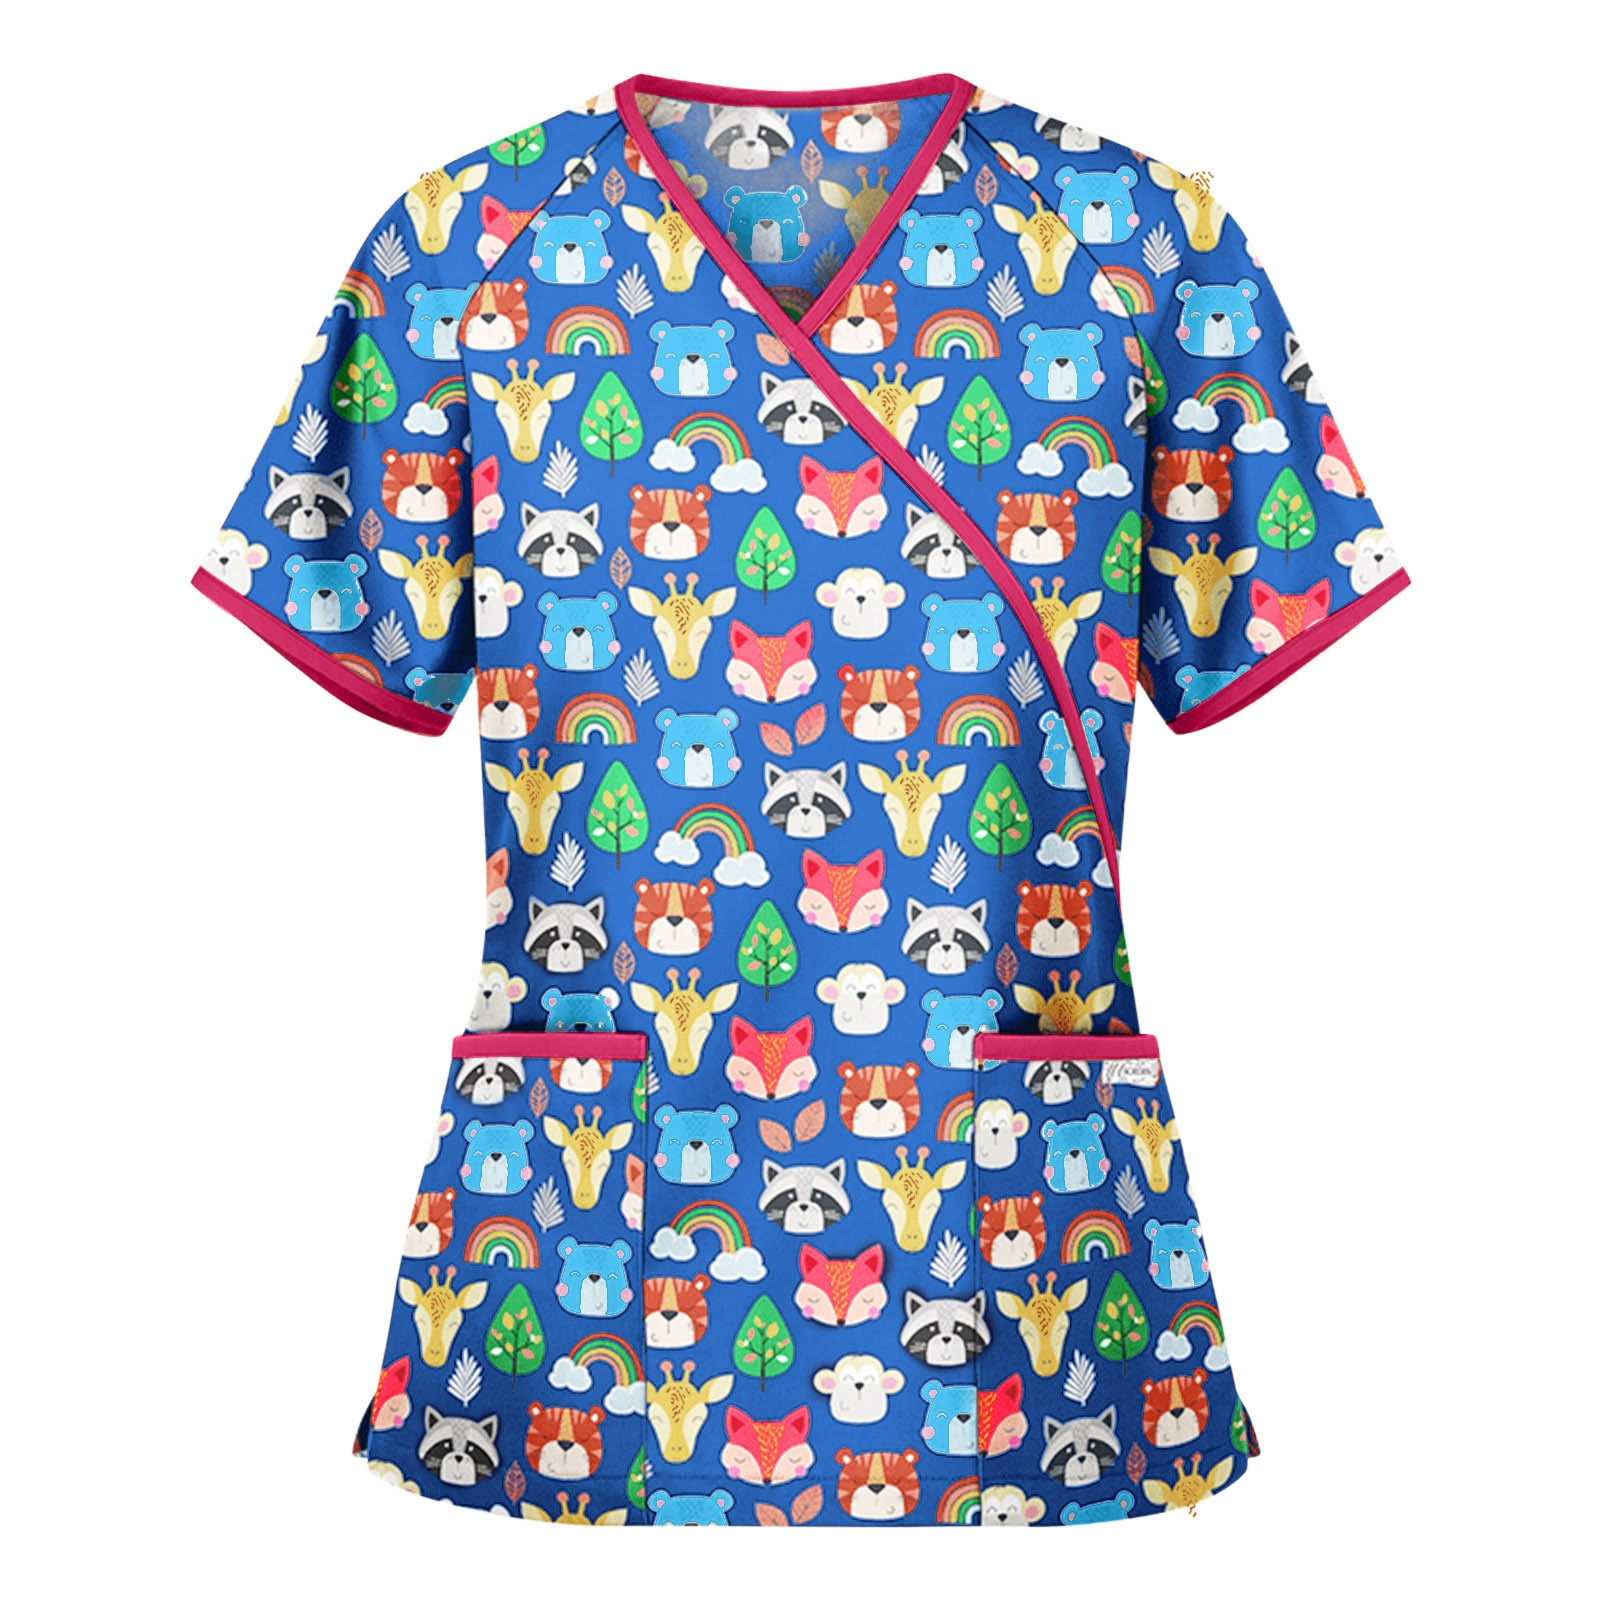 Women's Scrub Tops Medical SPA Uniforms Dentist Nurse Scrubs Summer Short Sleeve V-neck Carer Blouse Adjustable Waist Belts A20